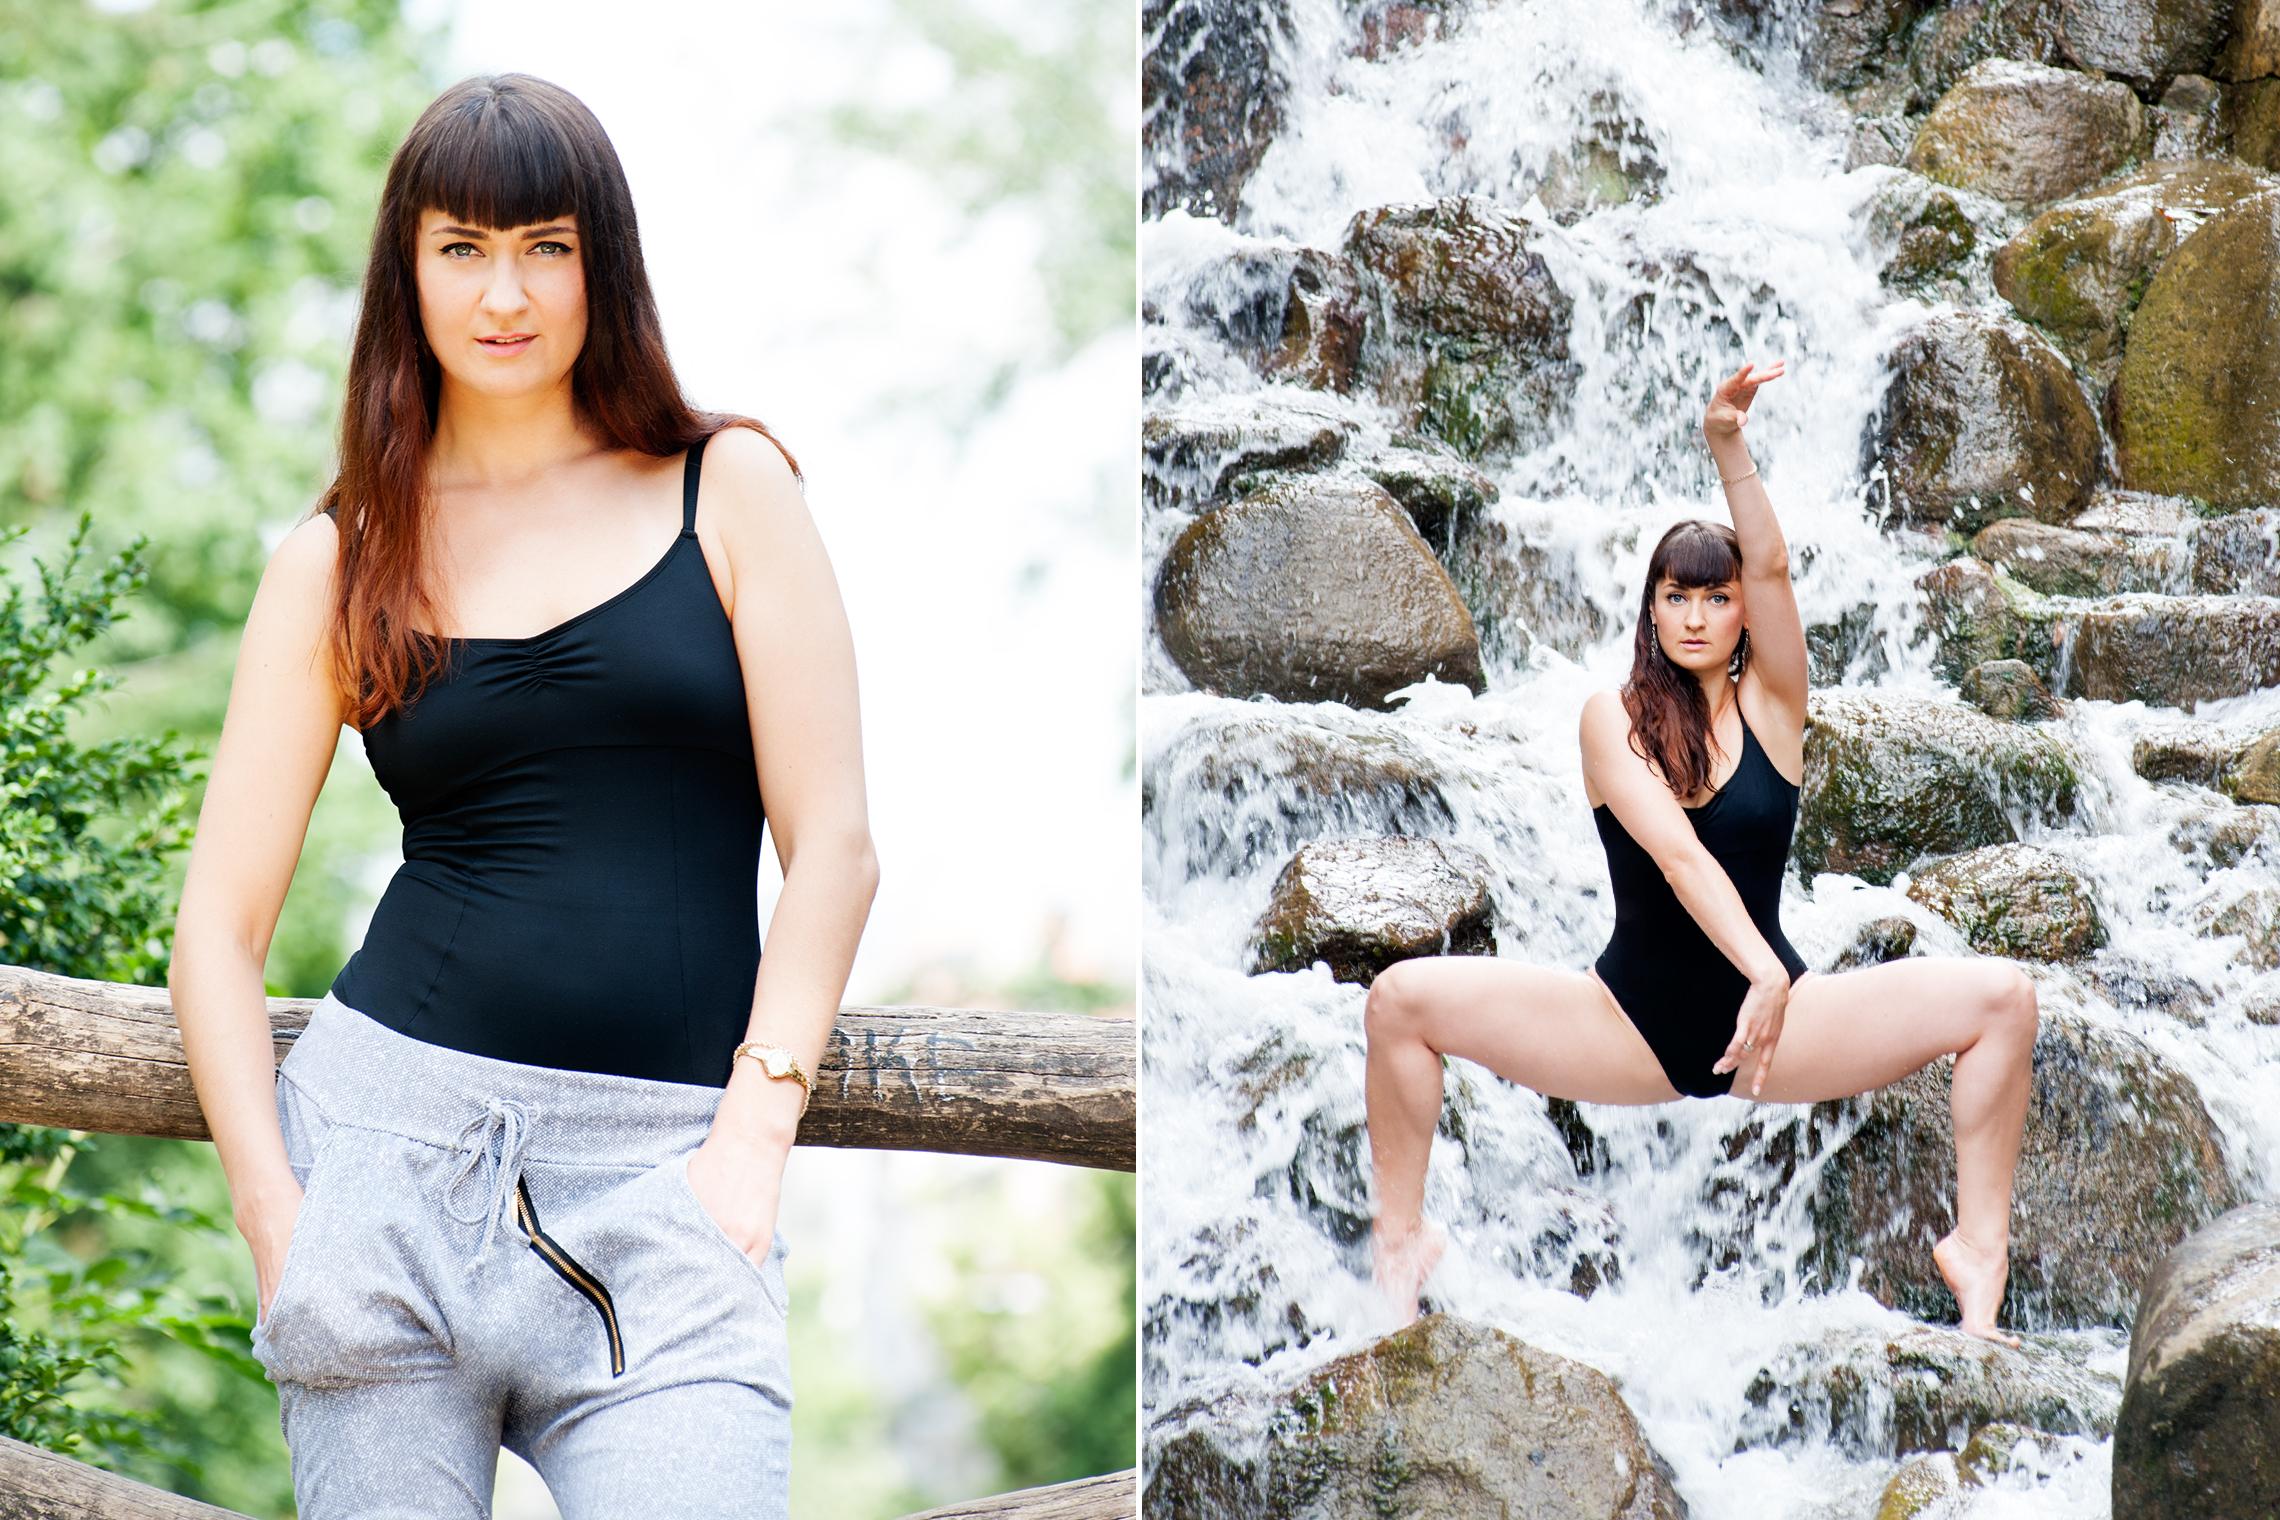 TänzerinnenFoto-FotoCaroHoene-Künstlerportrait-103